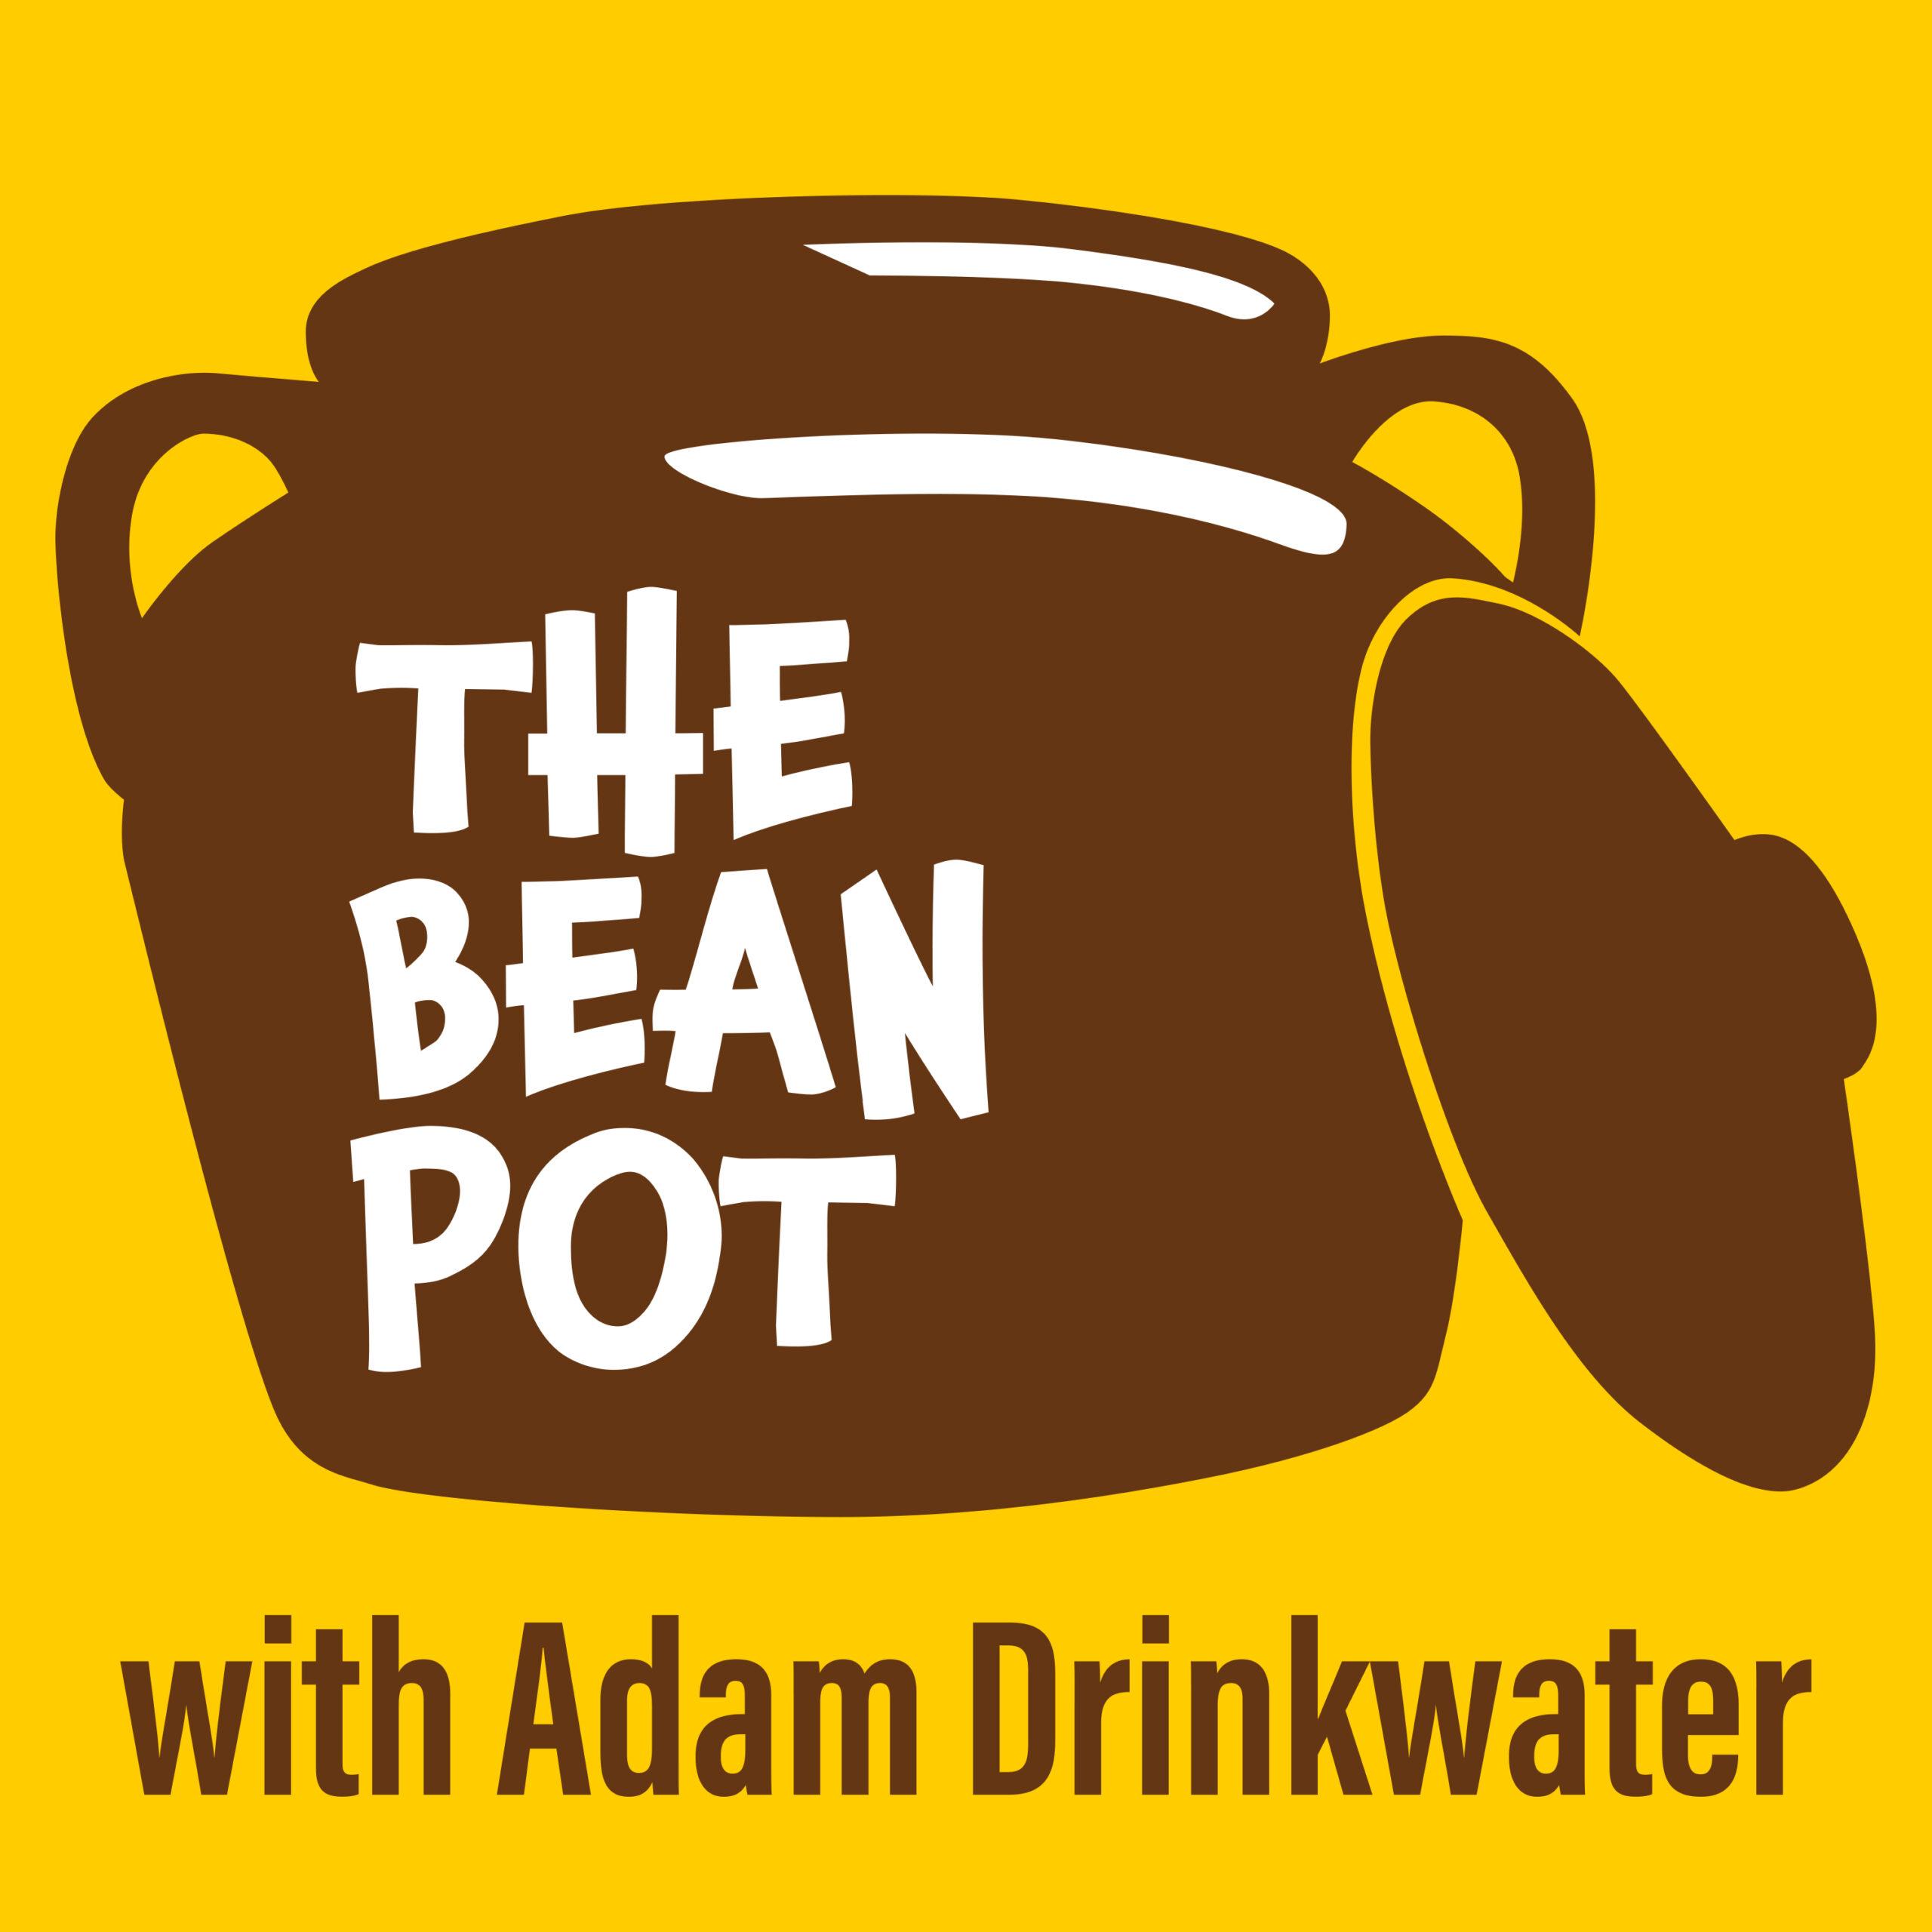 Adam Drinkwater